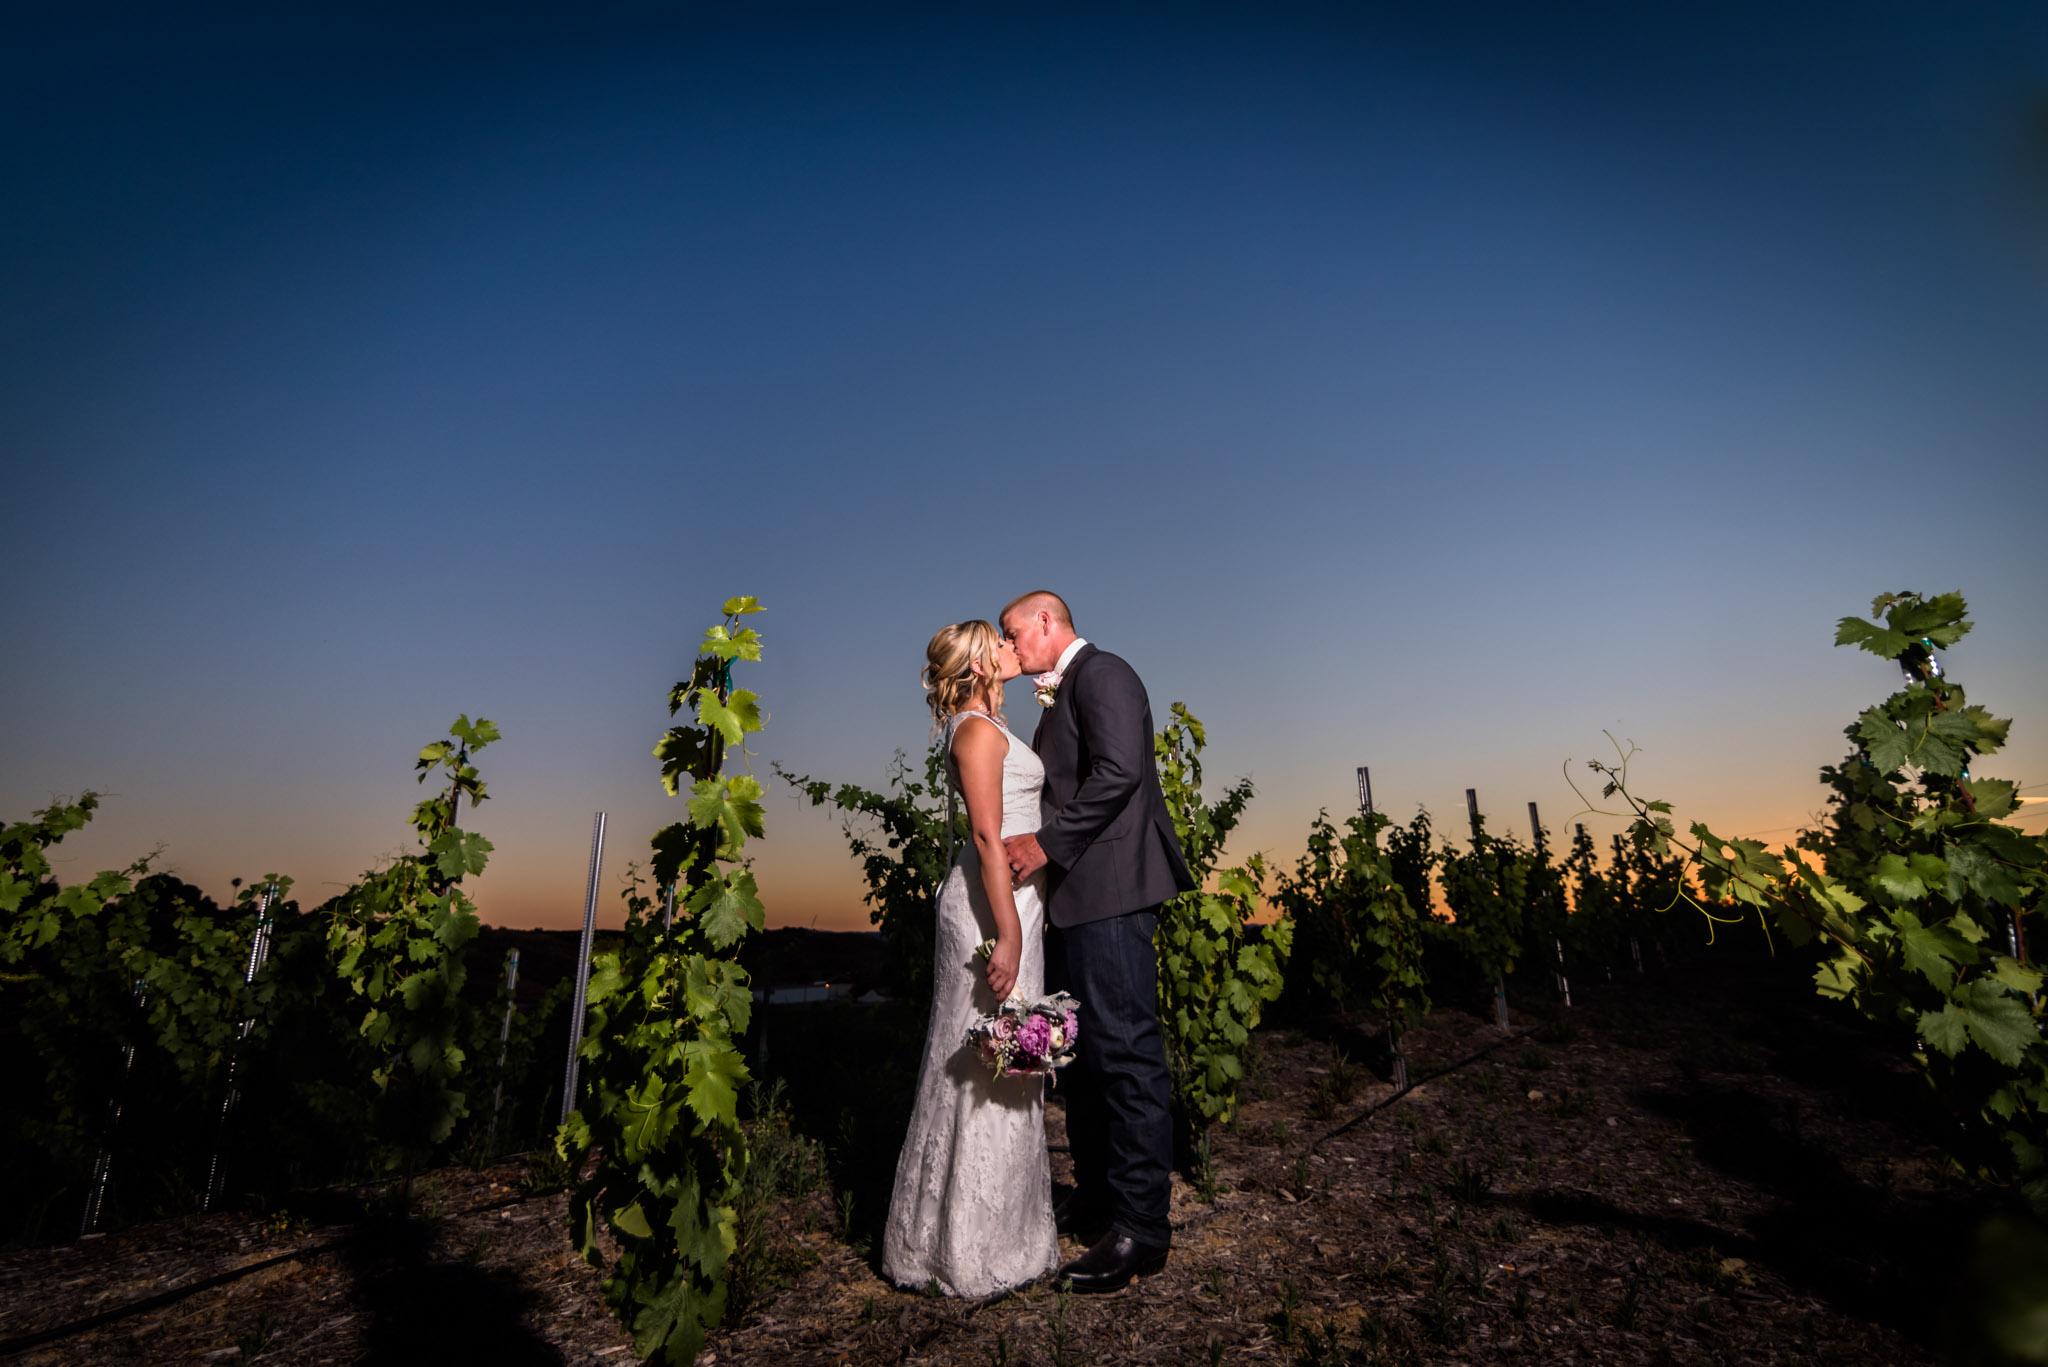 Avensole-Winery-Temecula-Wedding-Josh-and-Olivia-3857.JPG